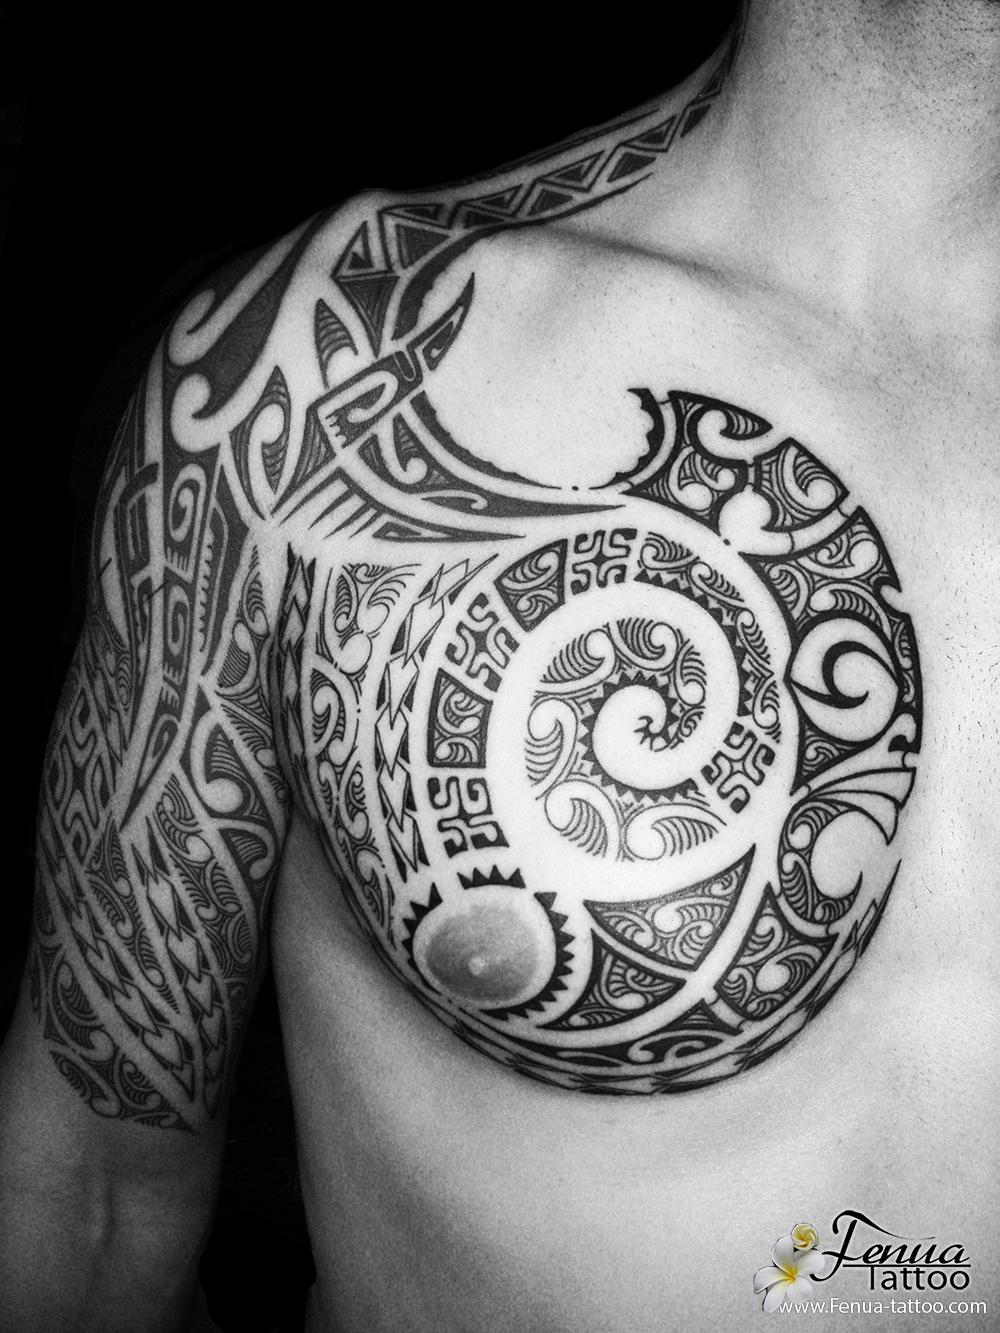 Tattoo tortue polynesien galerie tatouage - Tatouage tortue polynesien ...